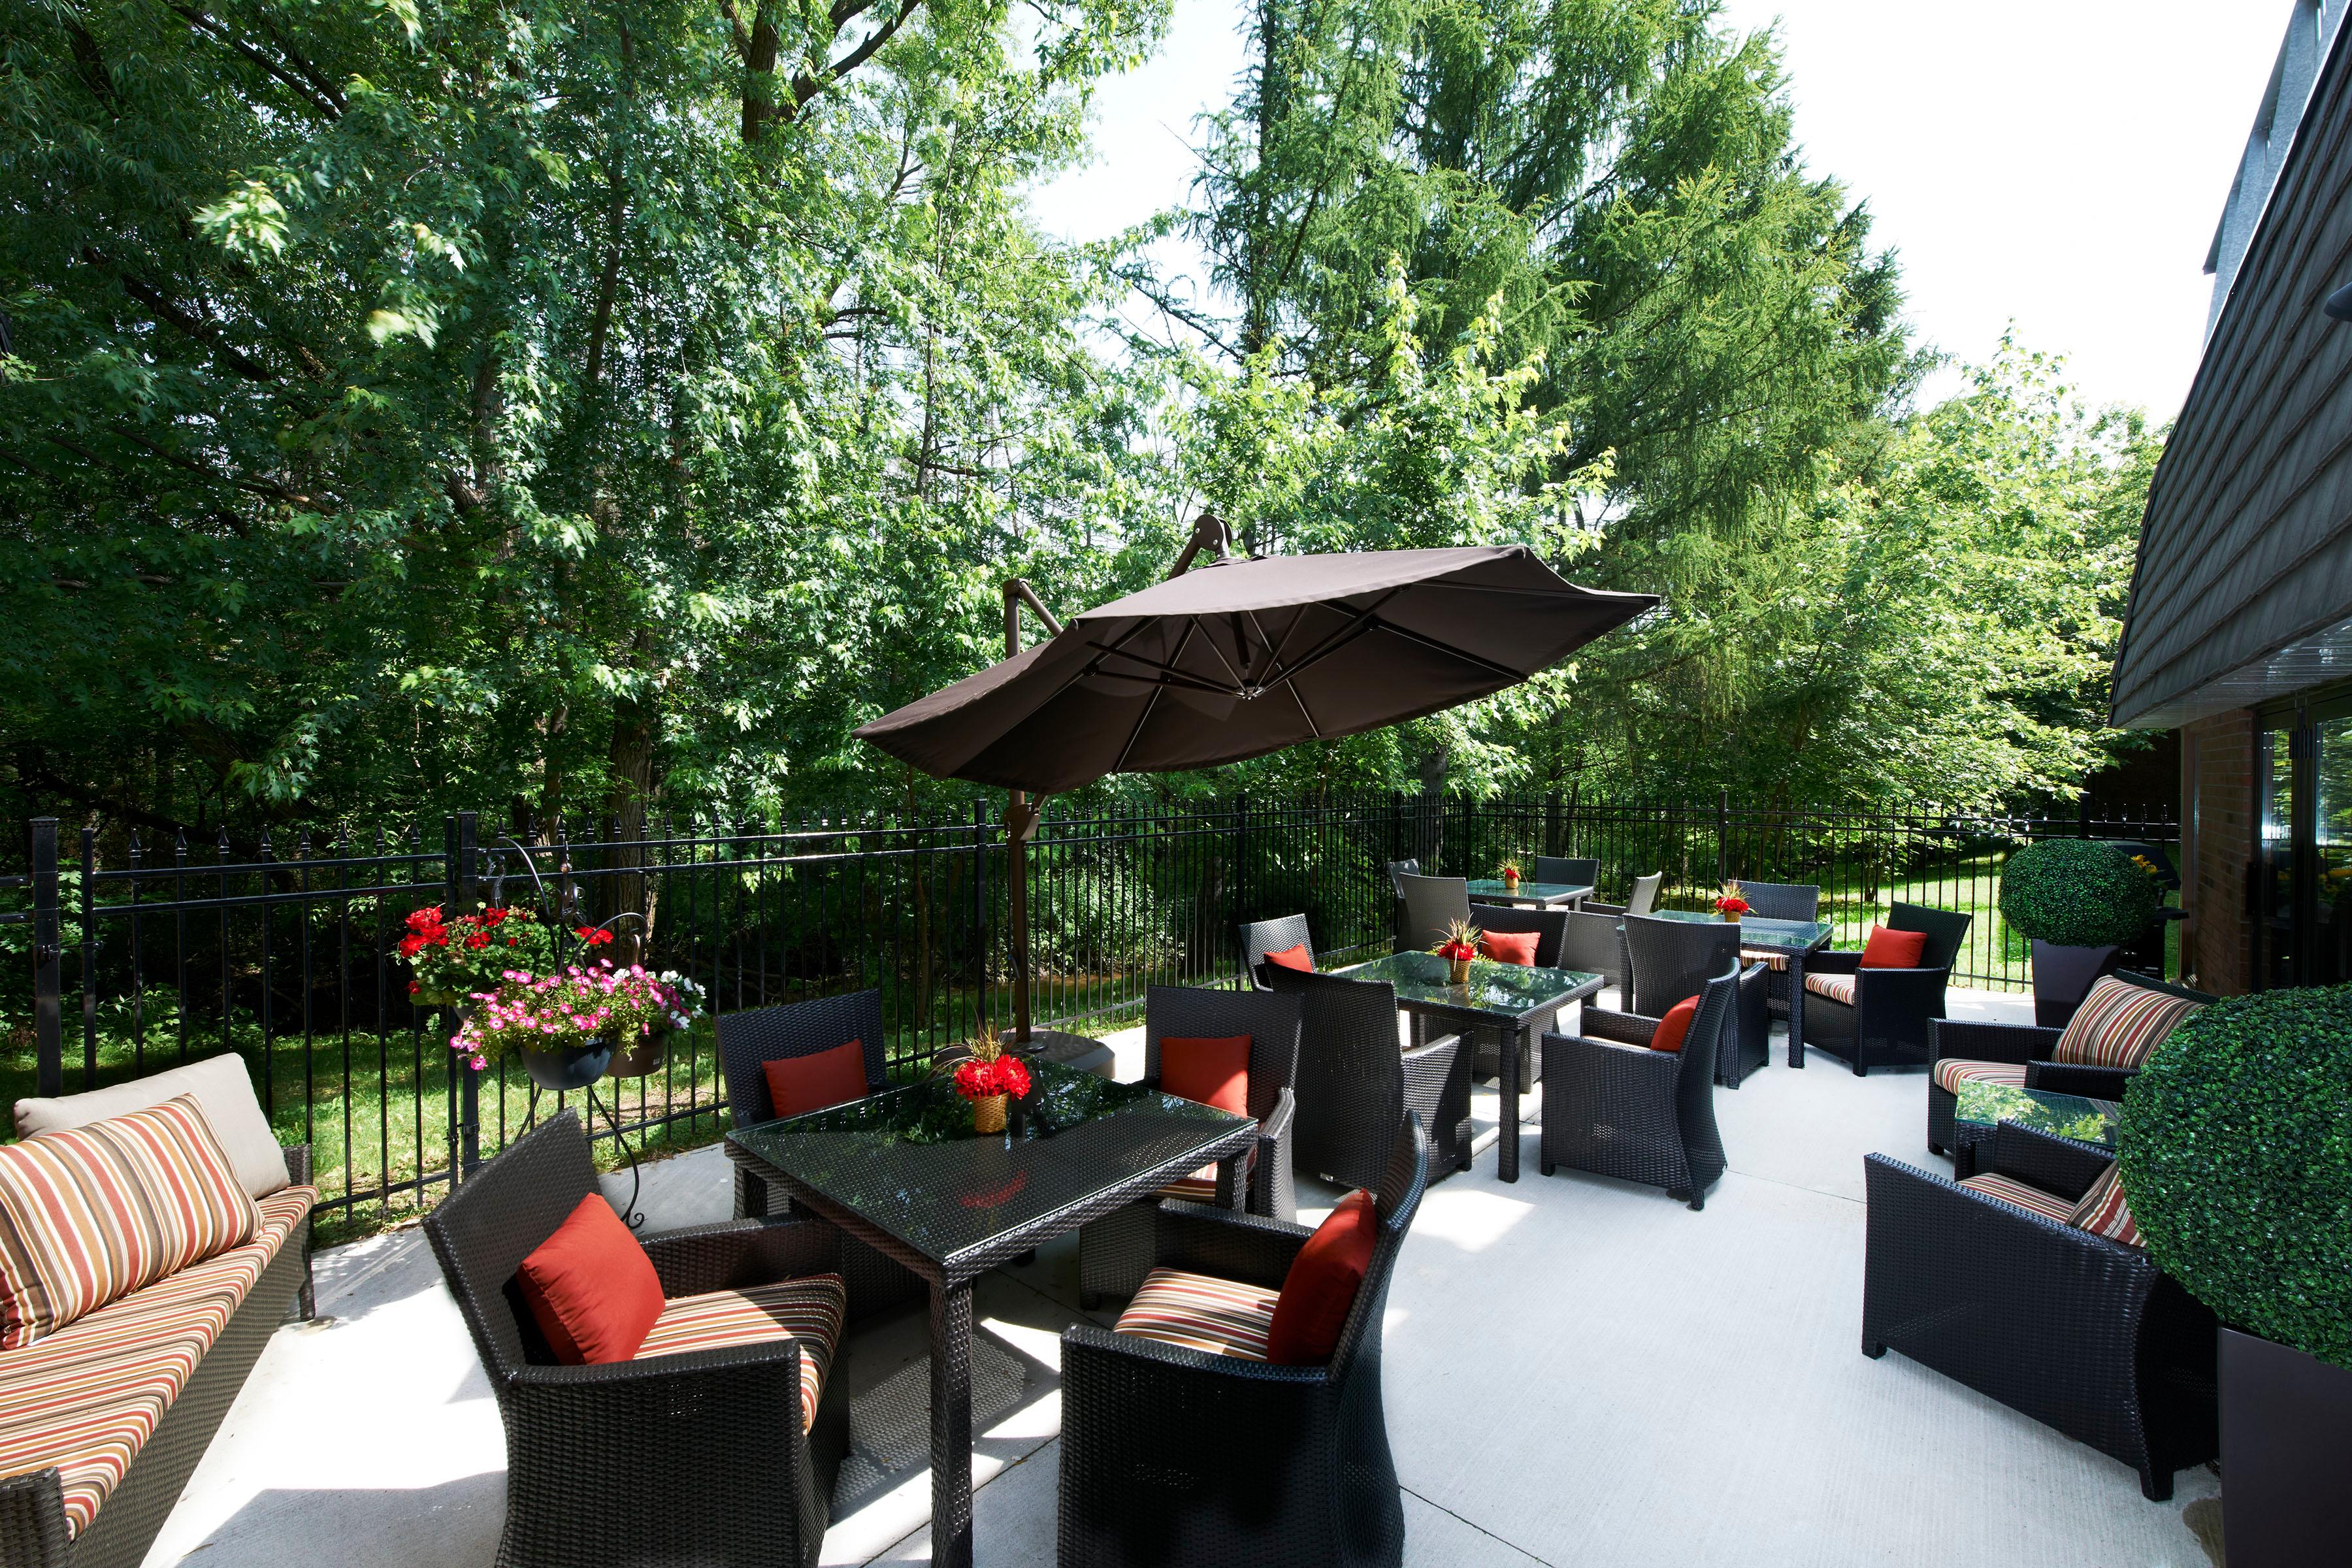 Revera Brookside Court & Hilltop Place Retirement Residence